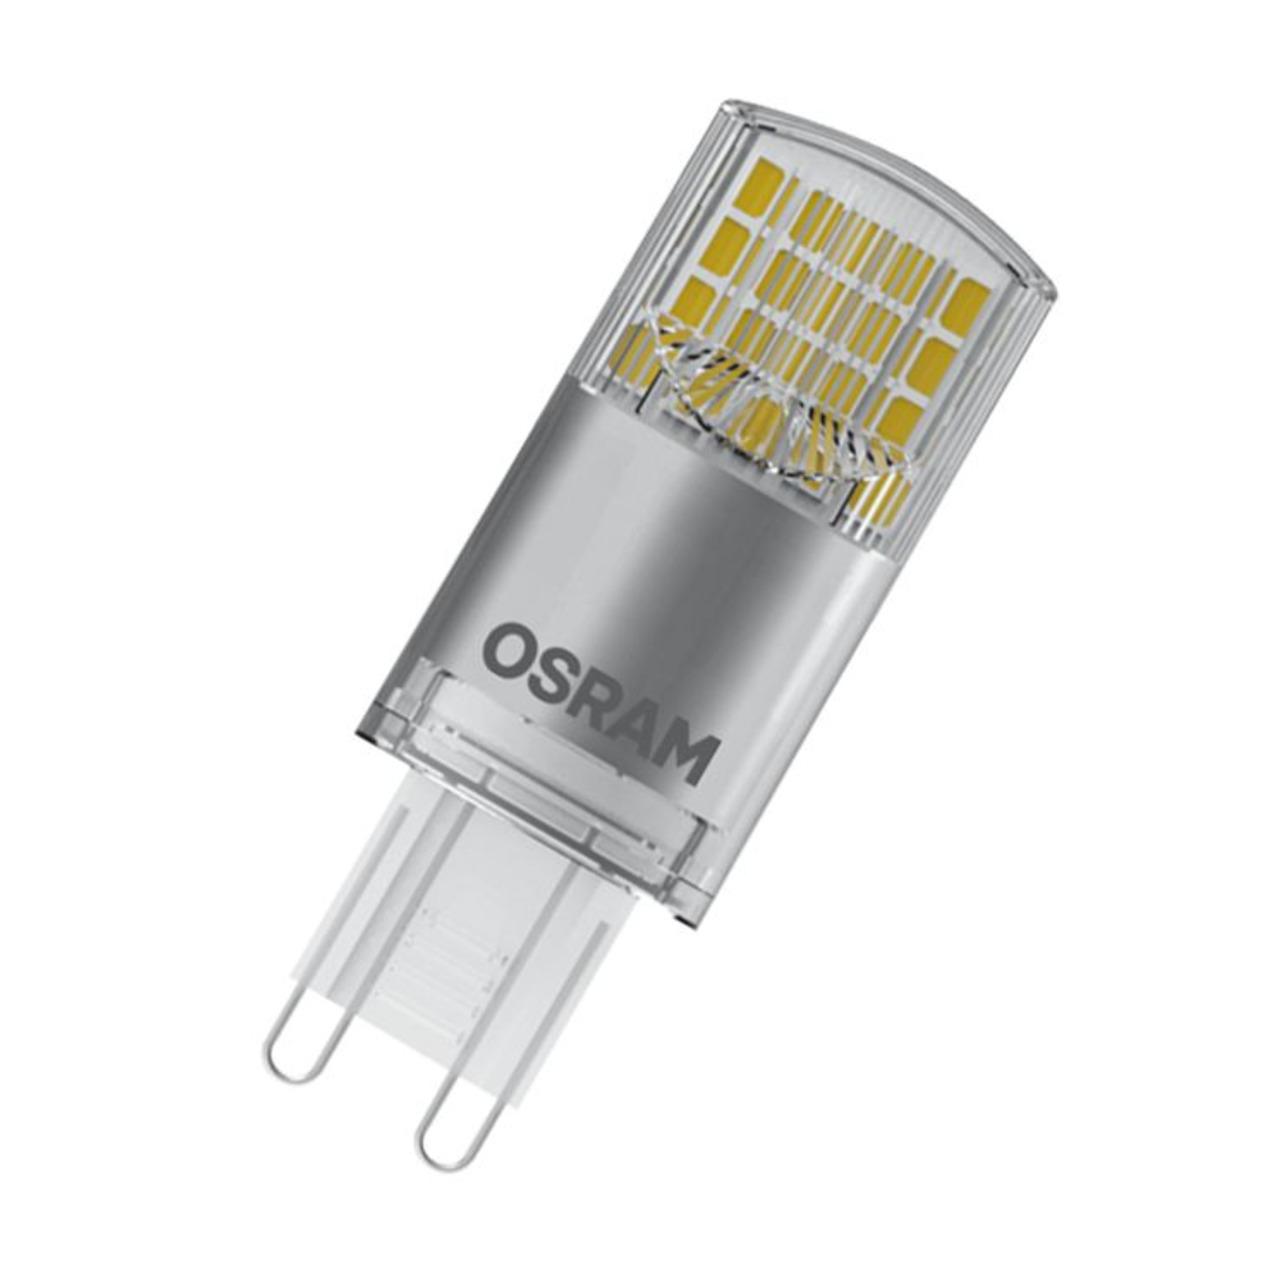 OSRAM 3-8-W-LED-Lampe T20- G9- 470 lm- neutralweiss